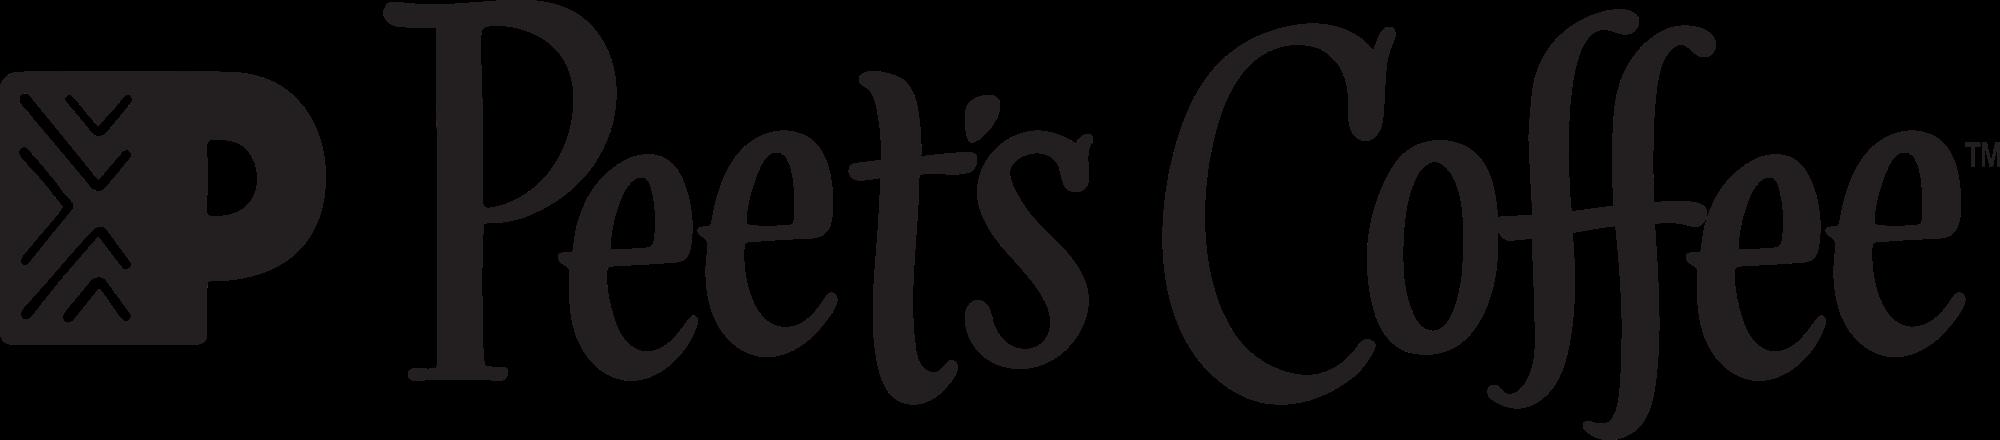 Peets Coffe Logo.png